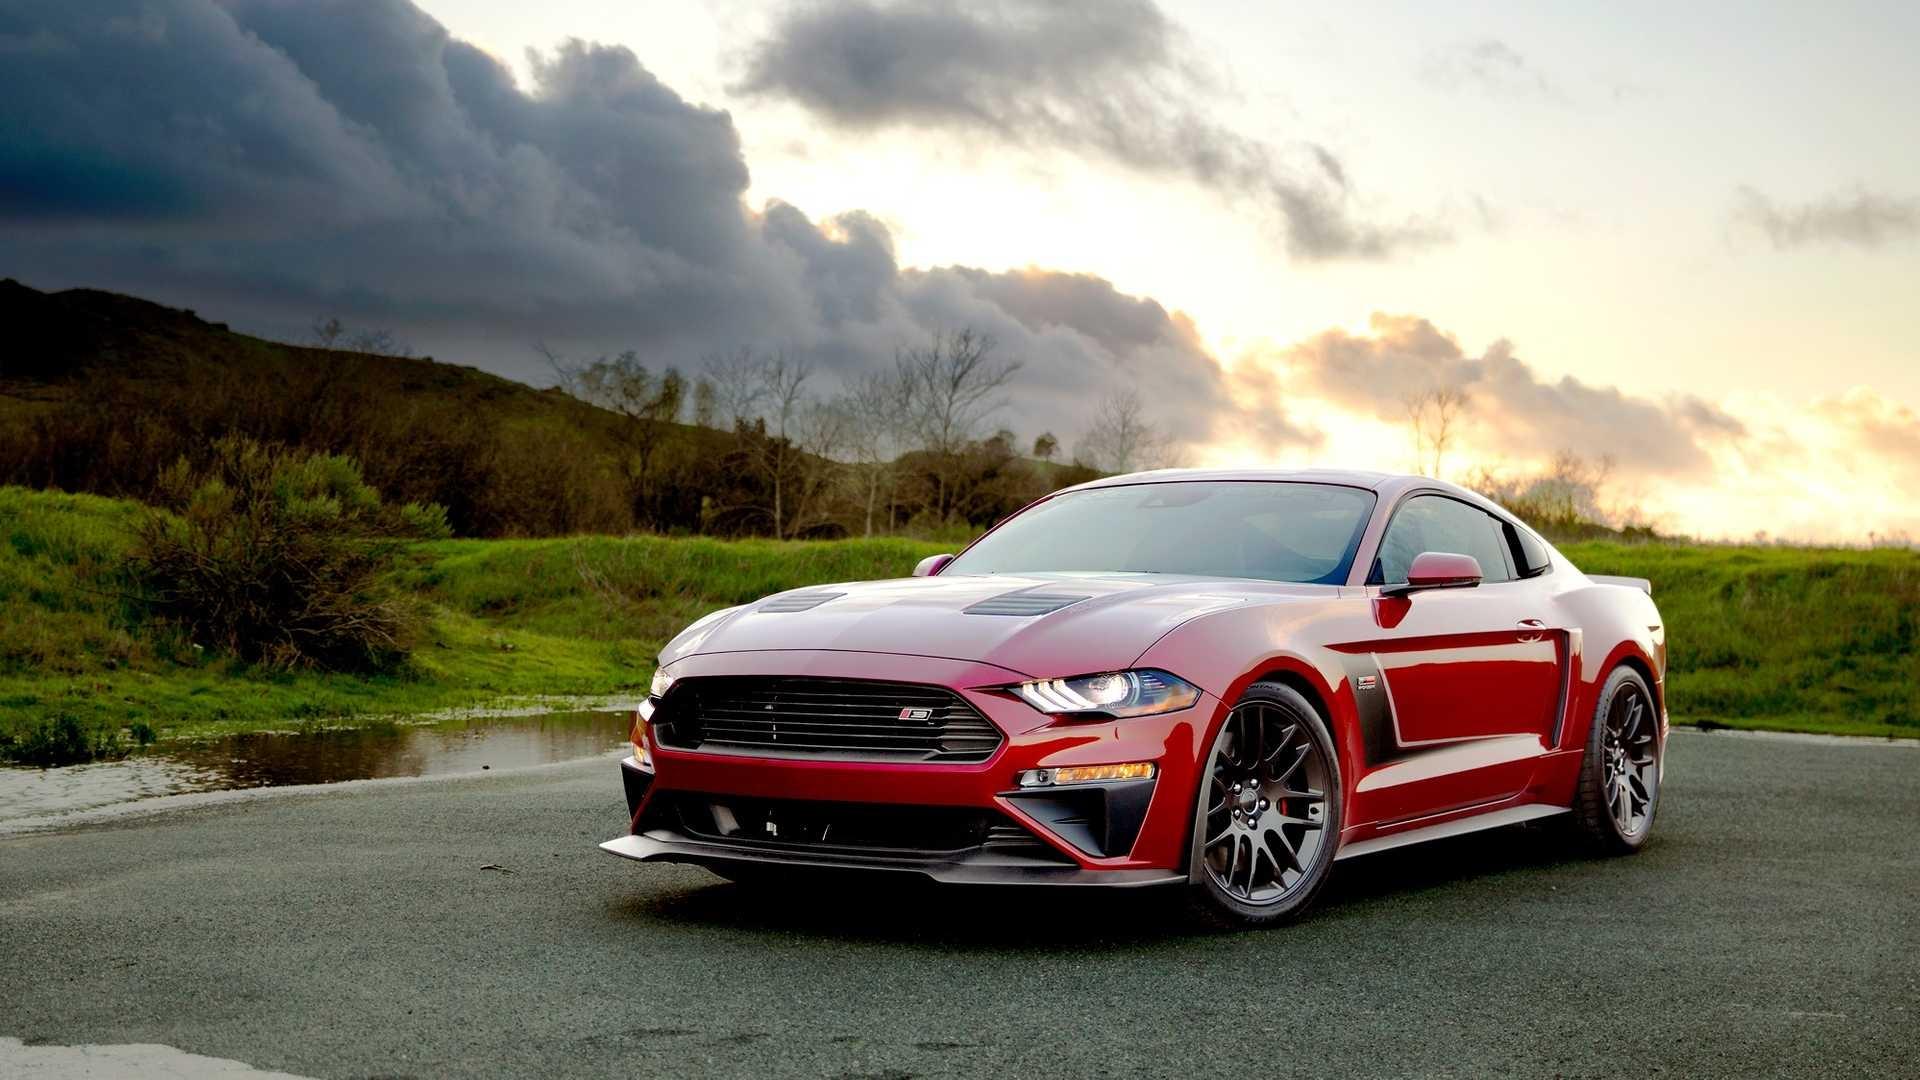 Roush Performance доработал F-150 и Mustang